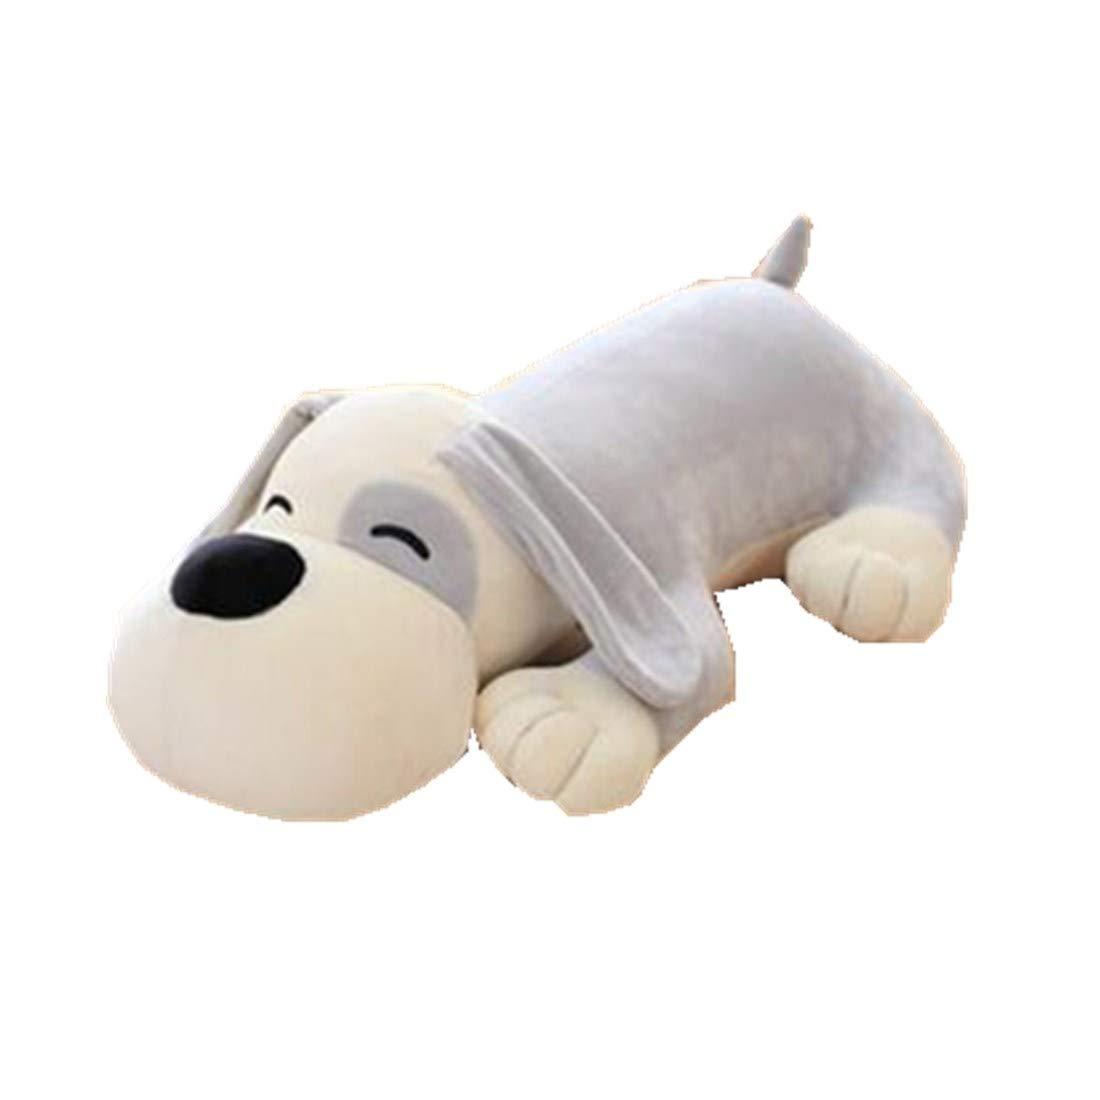 Cartoon Animal escalada perro cojín respaldo almohada oficina hogar almohada peluche, algodón, gris, 50cm Fat rabbit